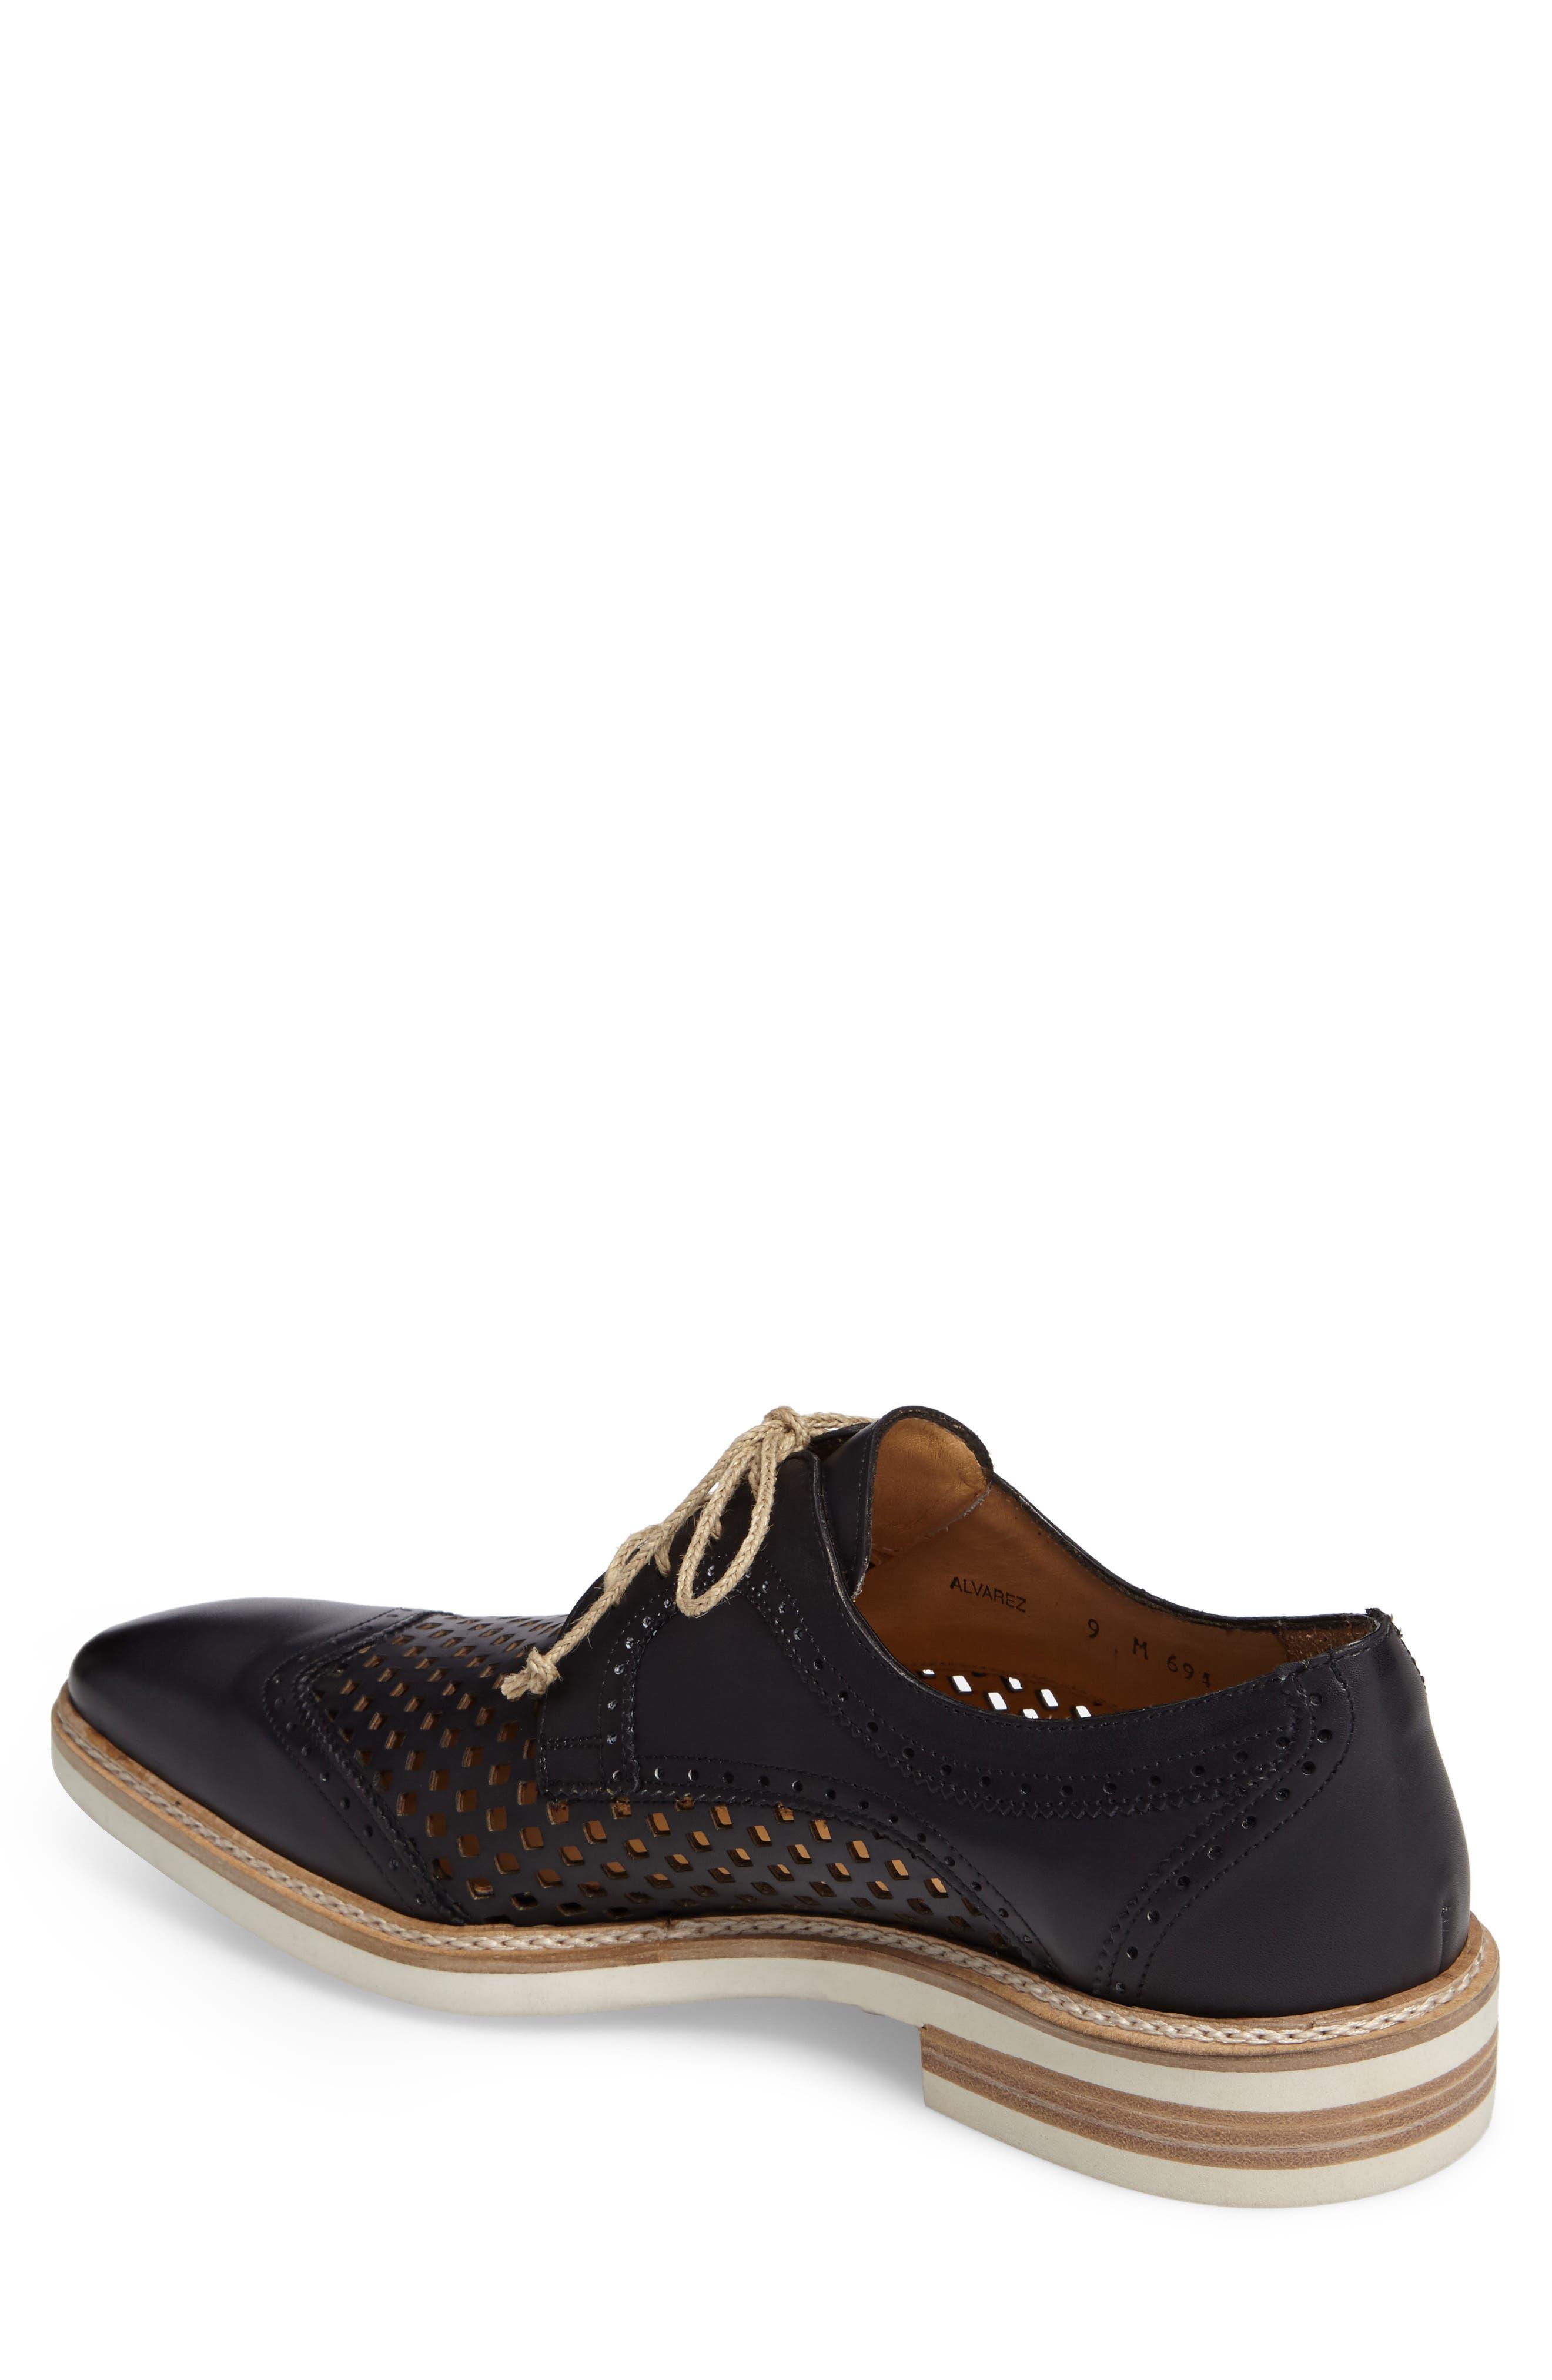 Alvarez Spectator Shoe,                             Alternate thumbnail 2, color,                             001